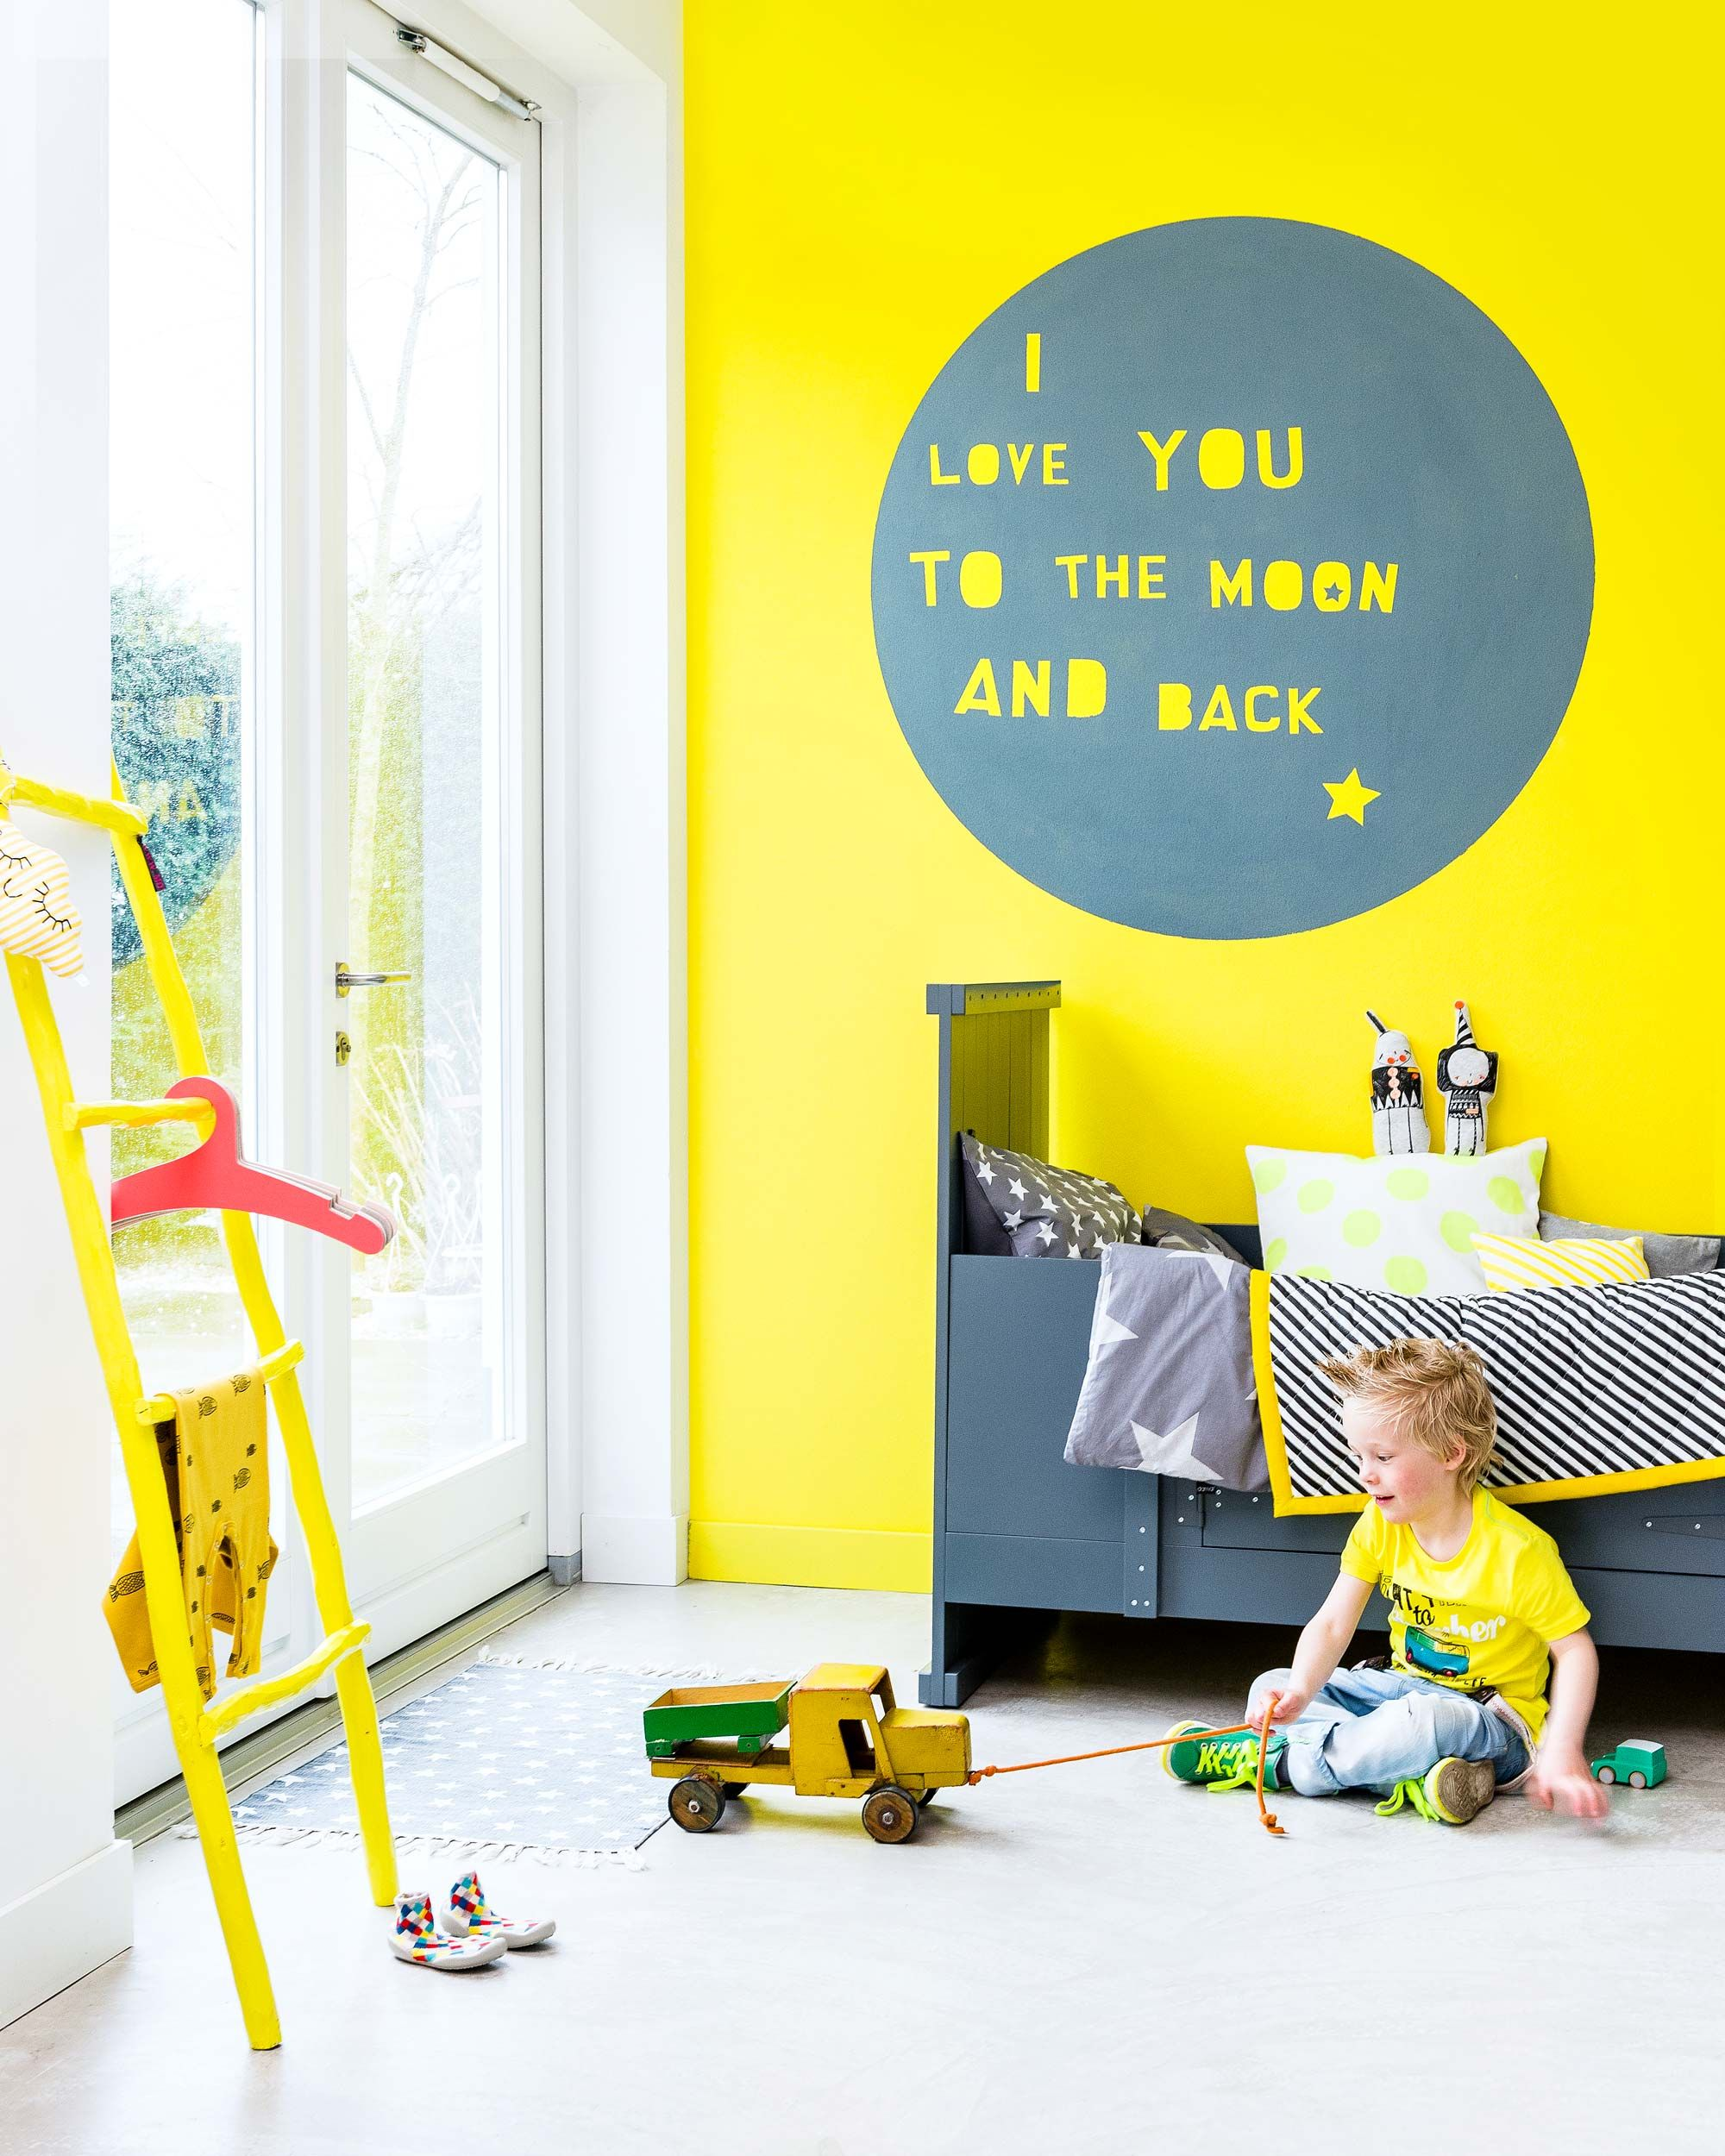 Pin by SvMinkova on ❥❥ Kids\' Room Design Ideas ❥❥ | Pinterest ...